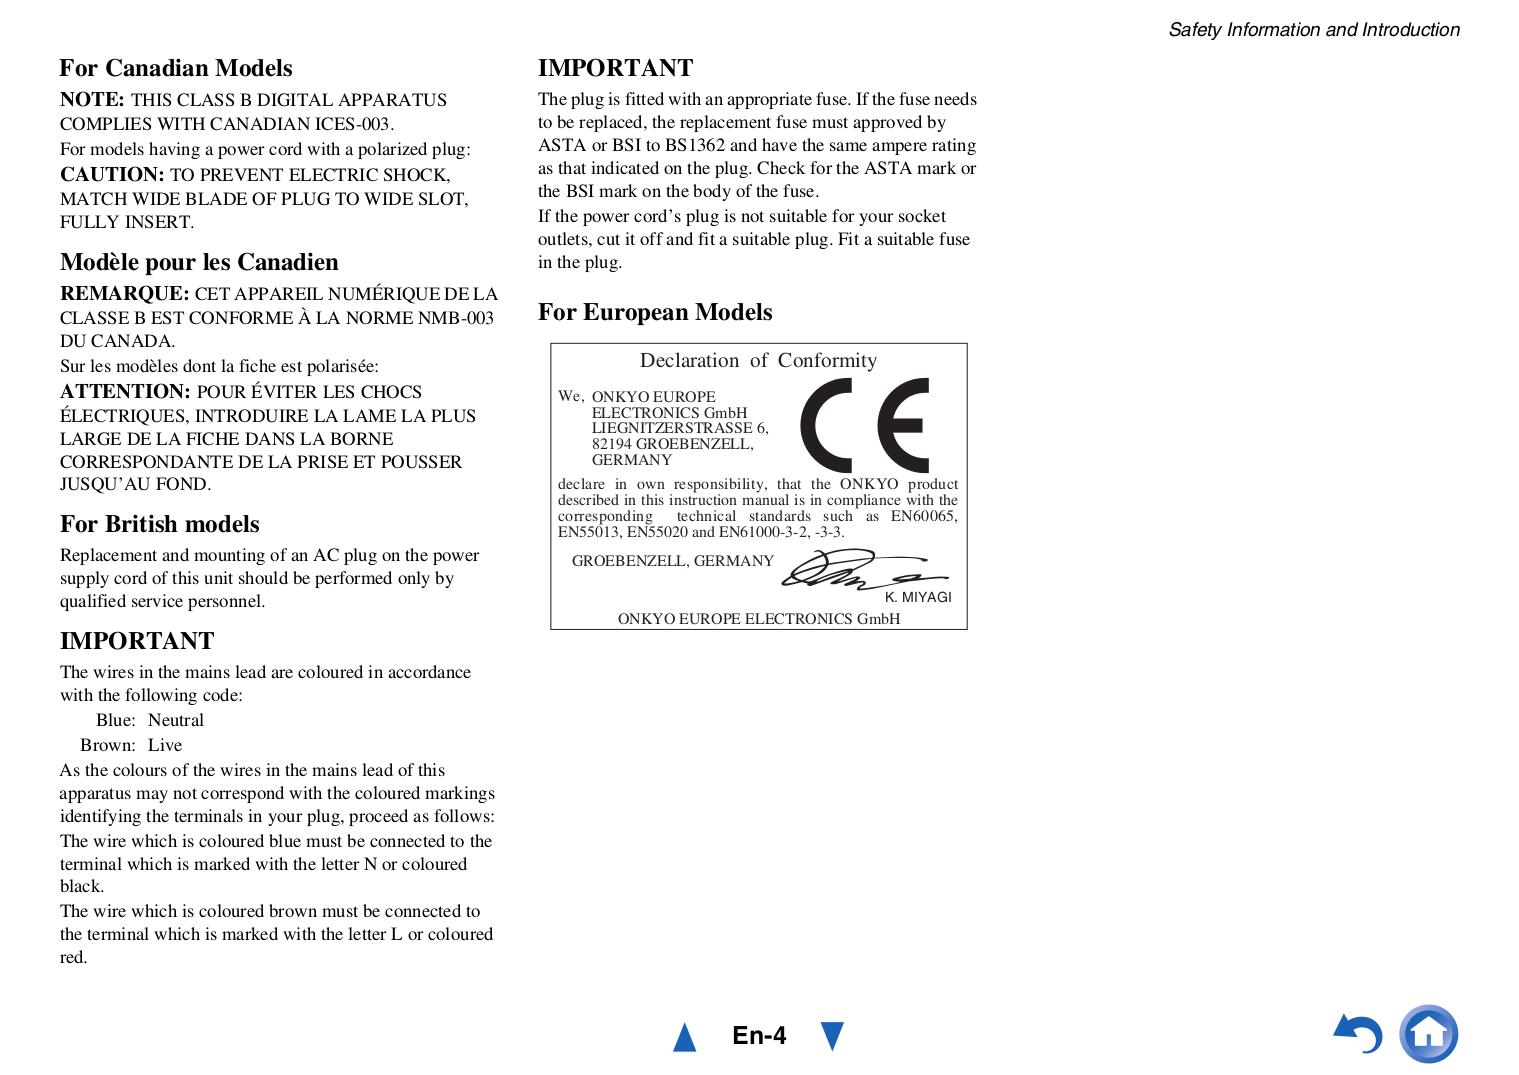 wharfedale diamond 9.1 manual